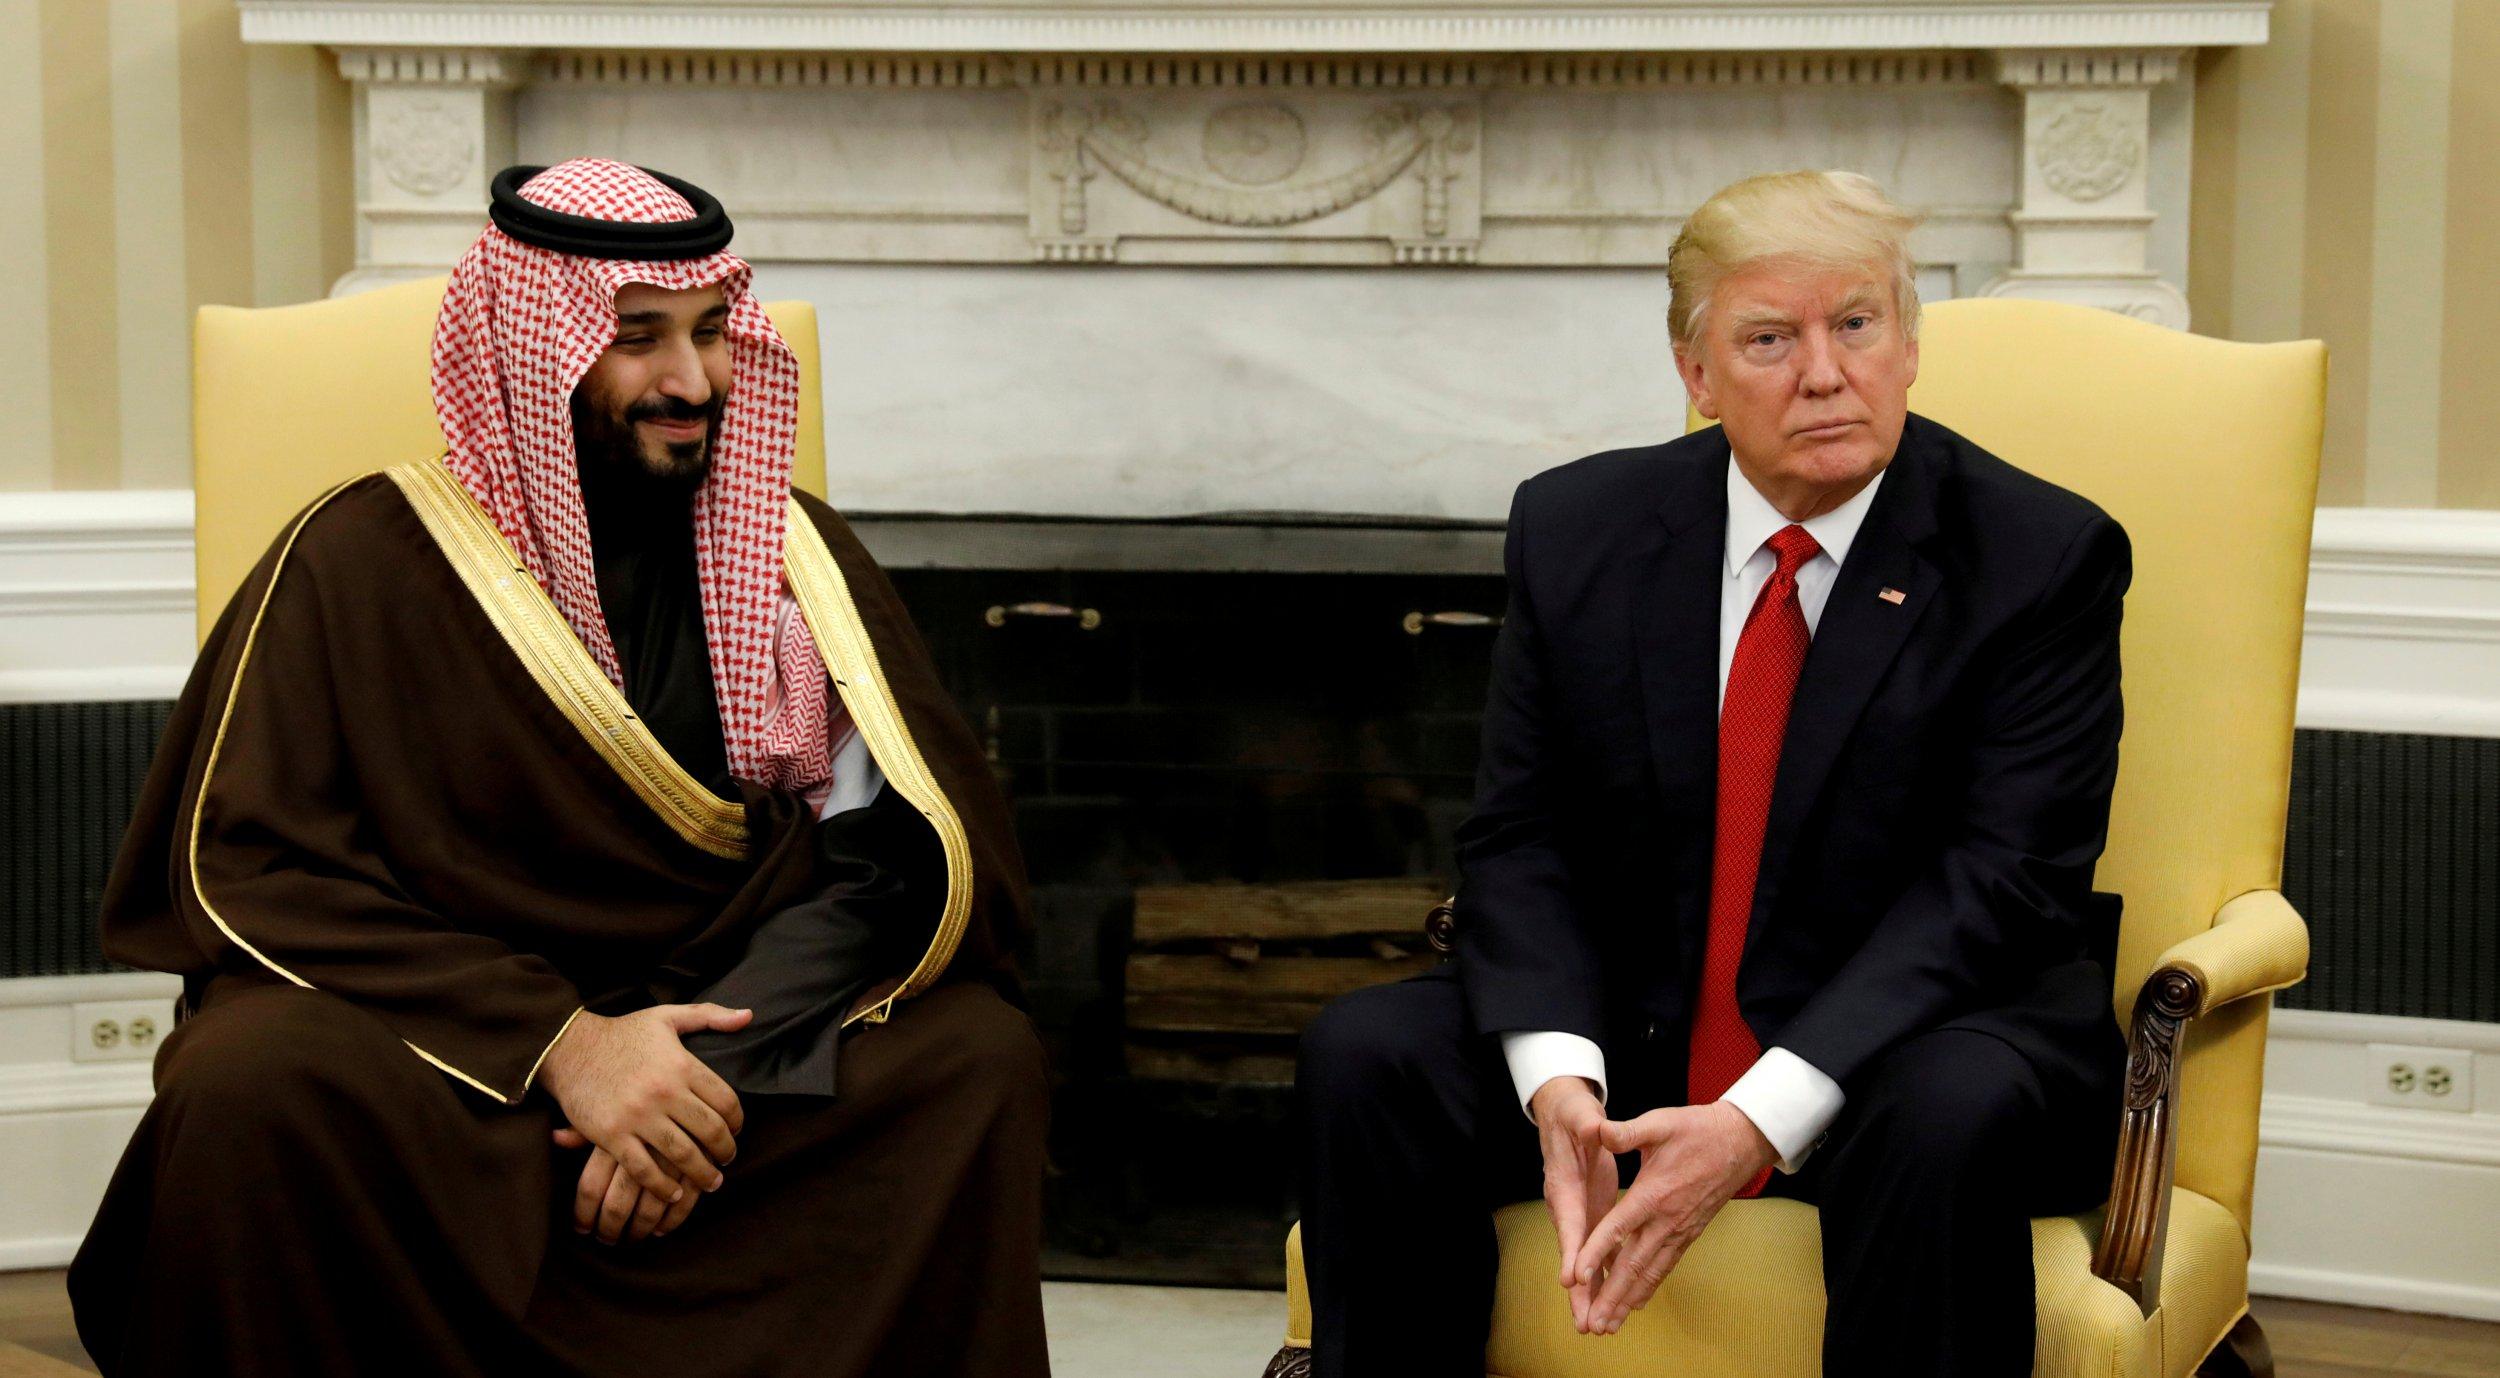 Saudi deputy crown prince and Trump